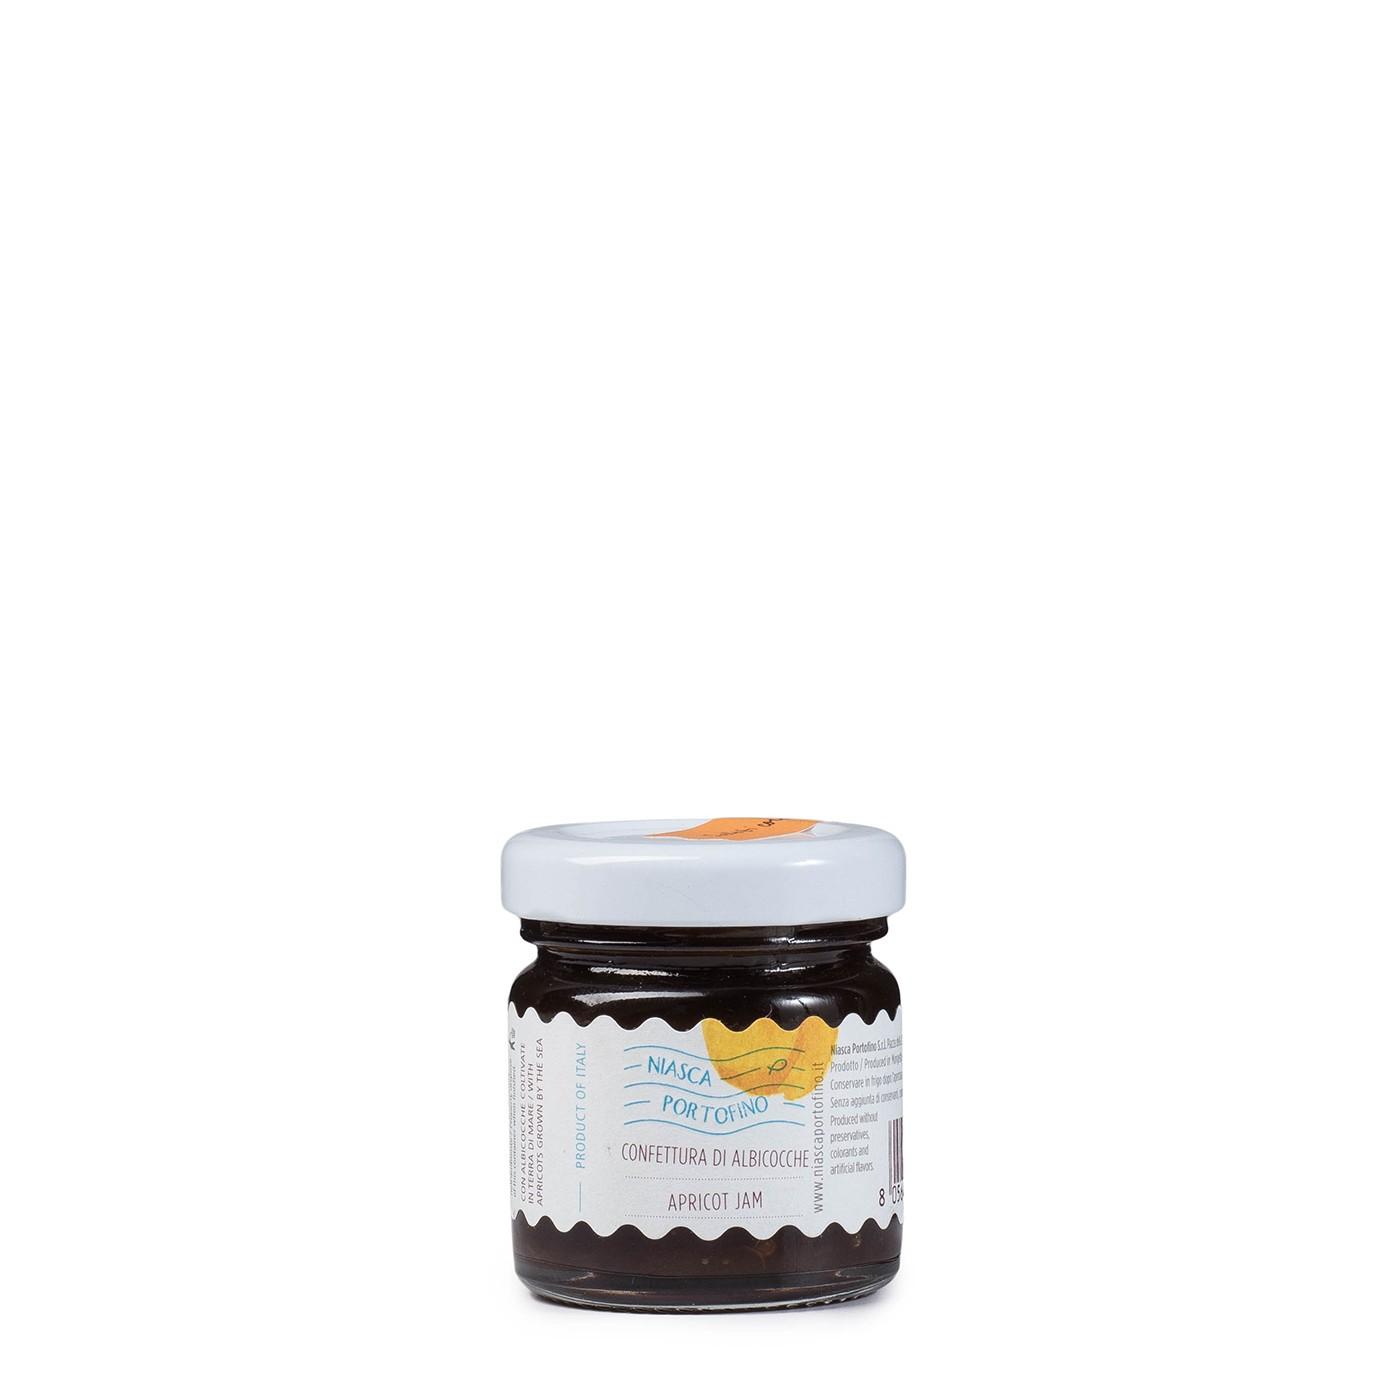 Apricot Jam 3.5 oz